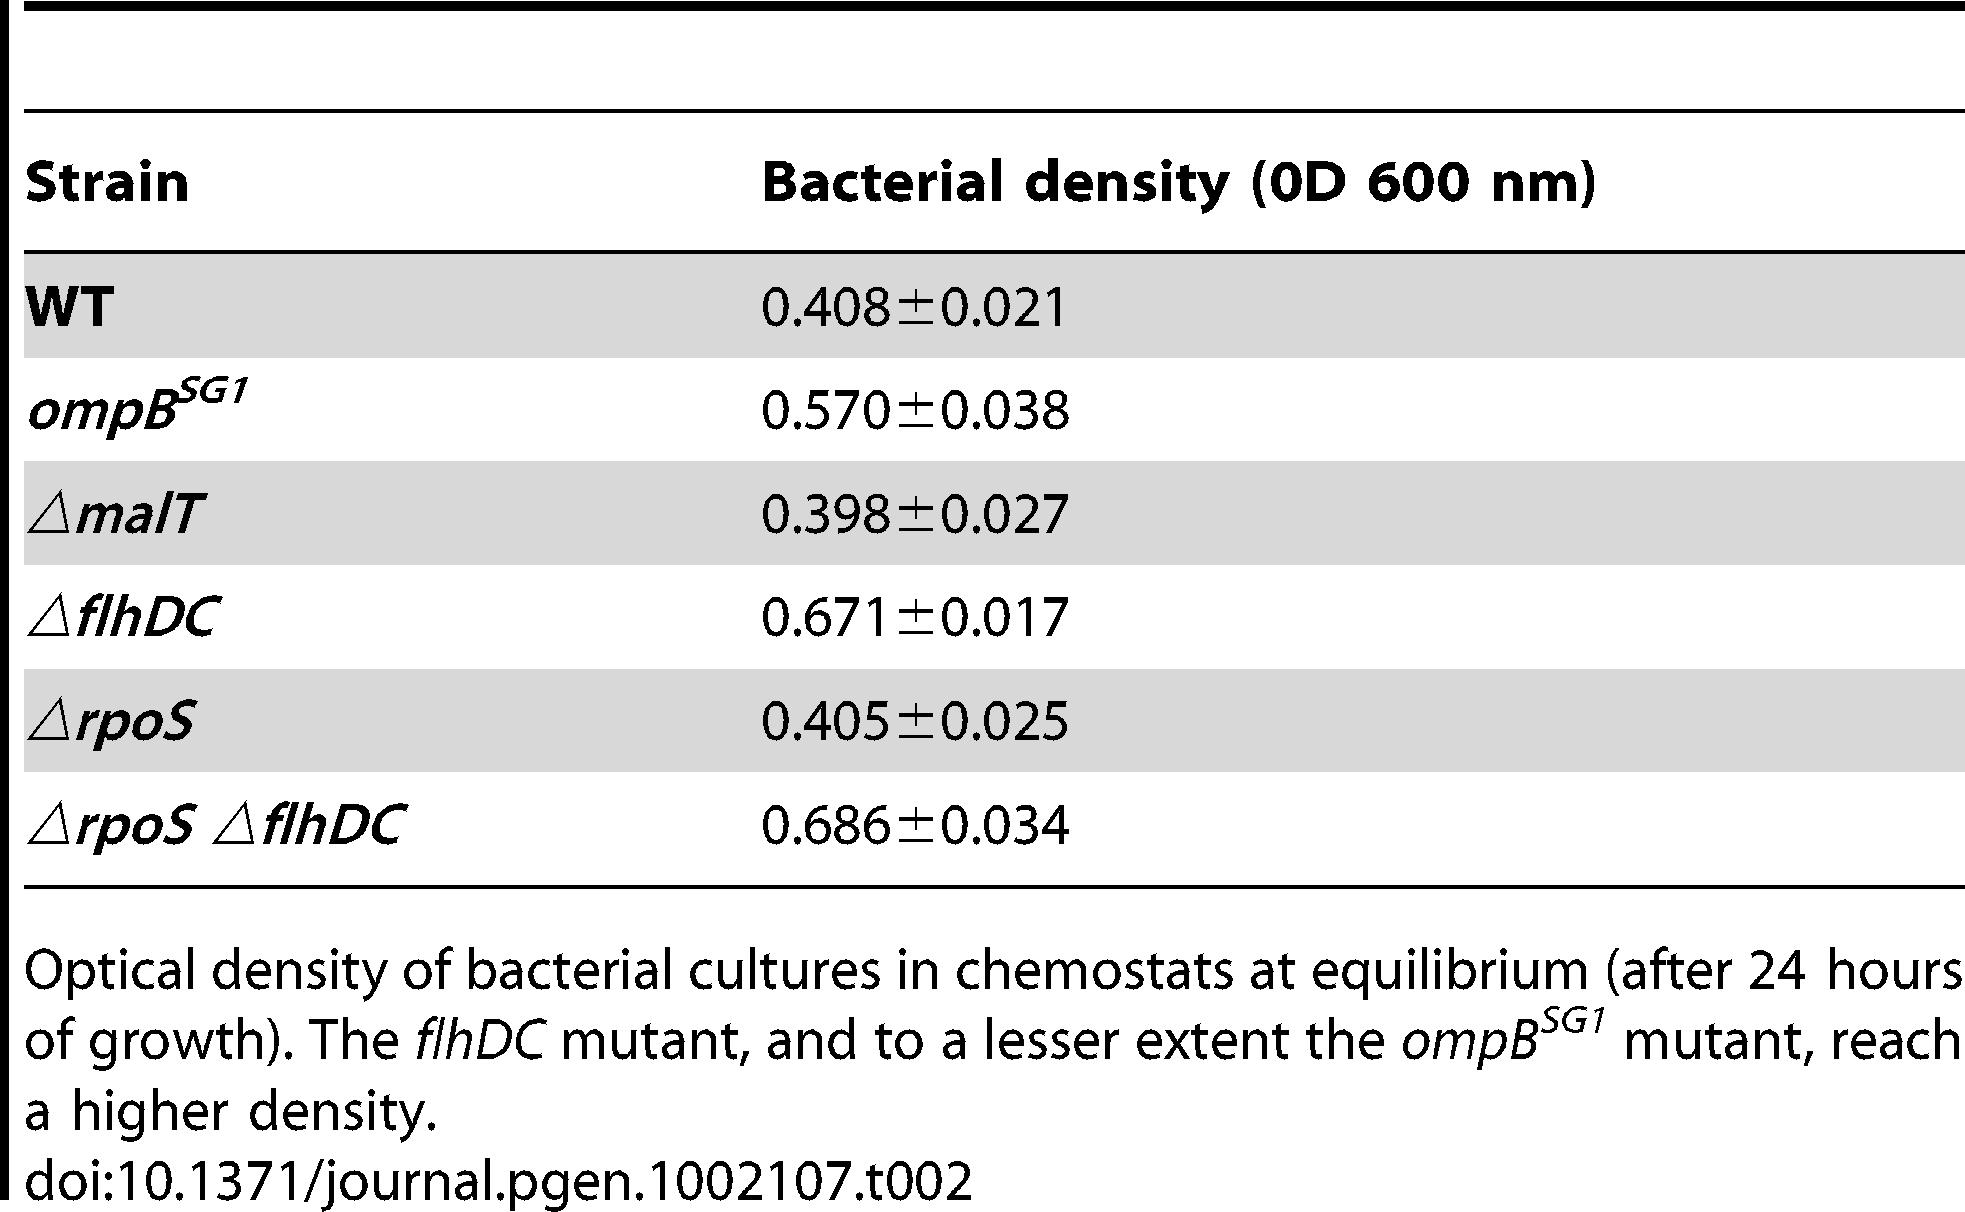 Bacterial density in chemostats.